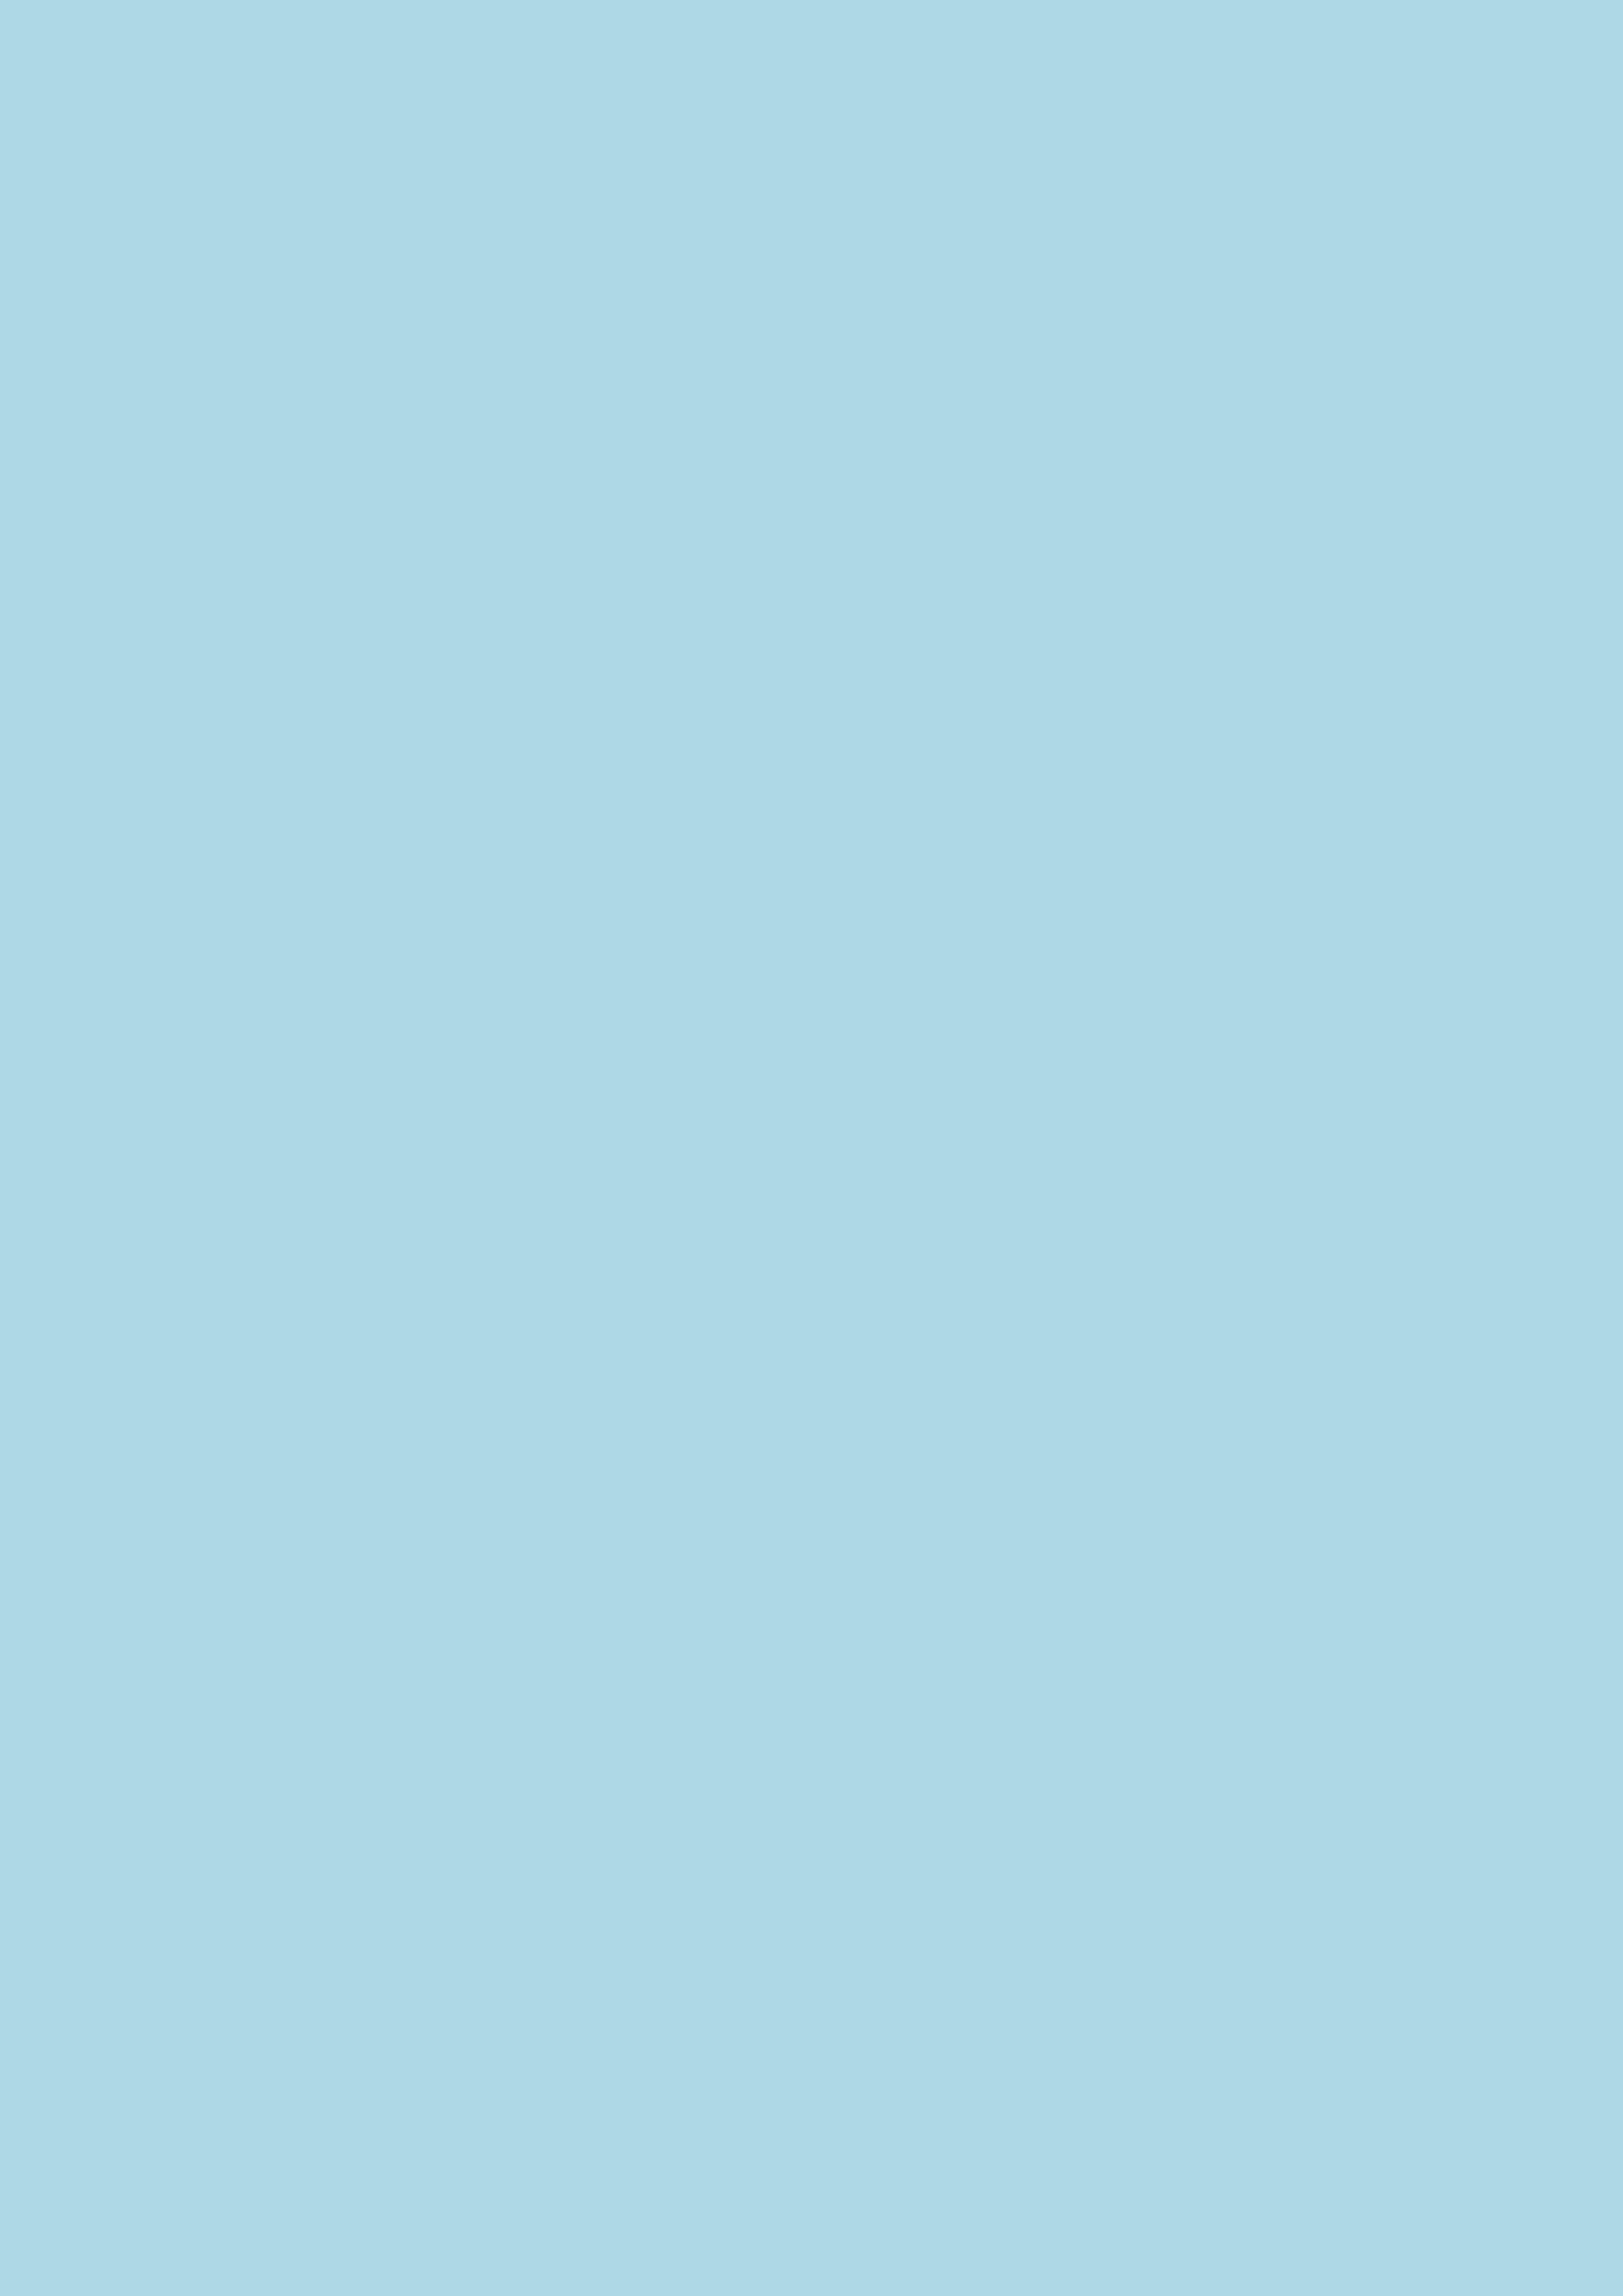 2480x3508 Light Blue Solid Color Background